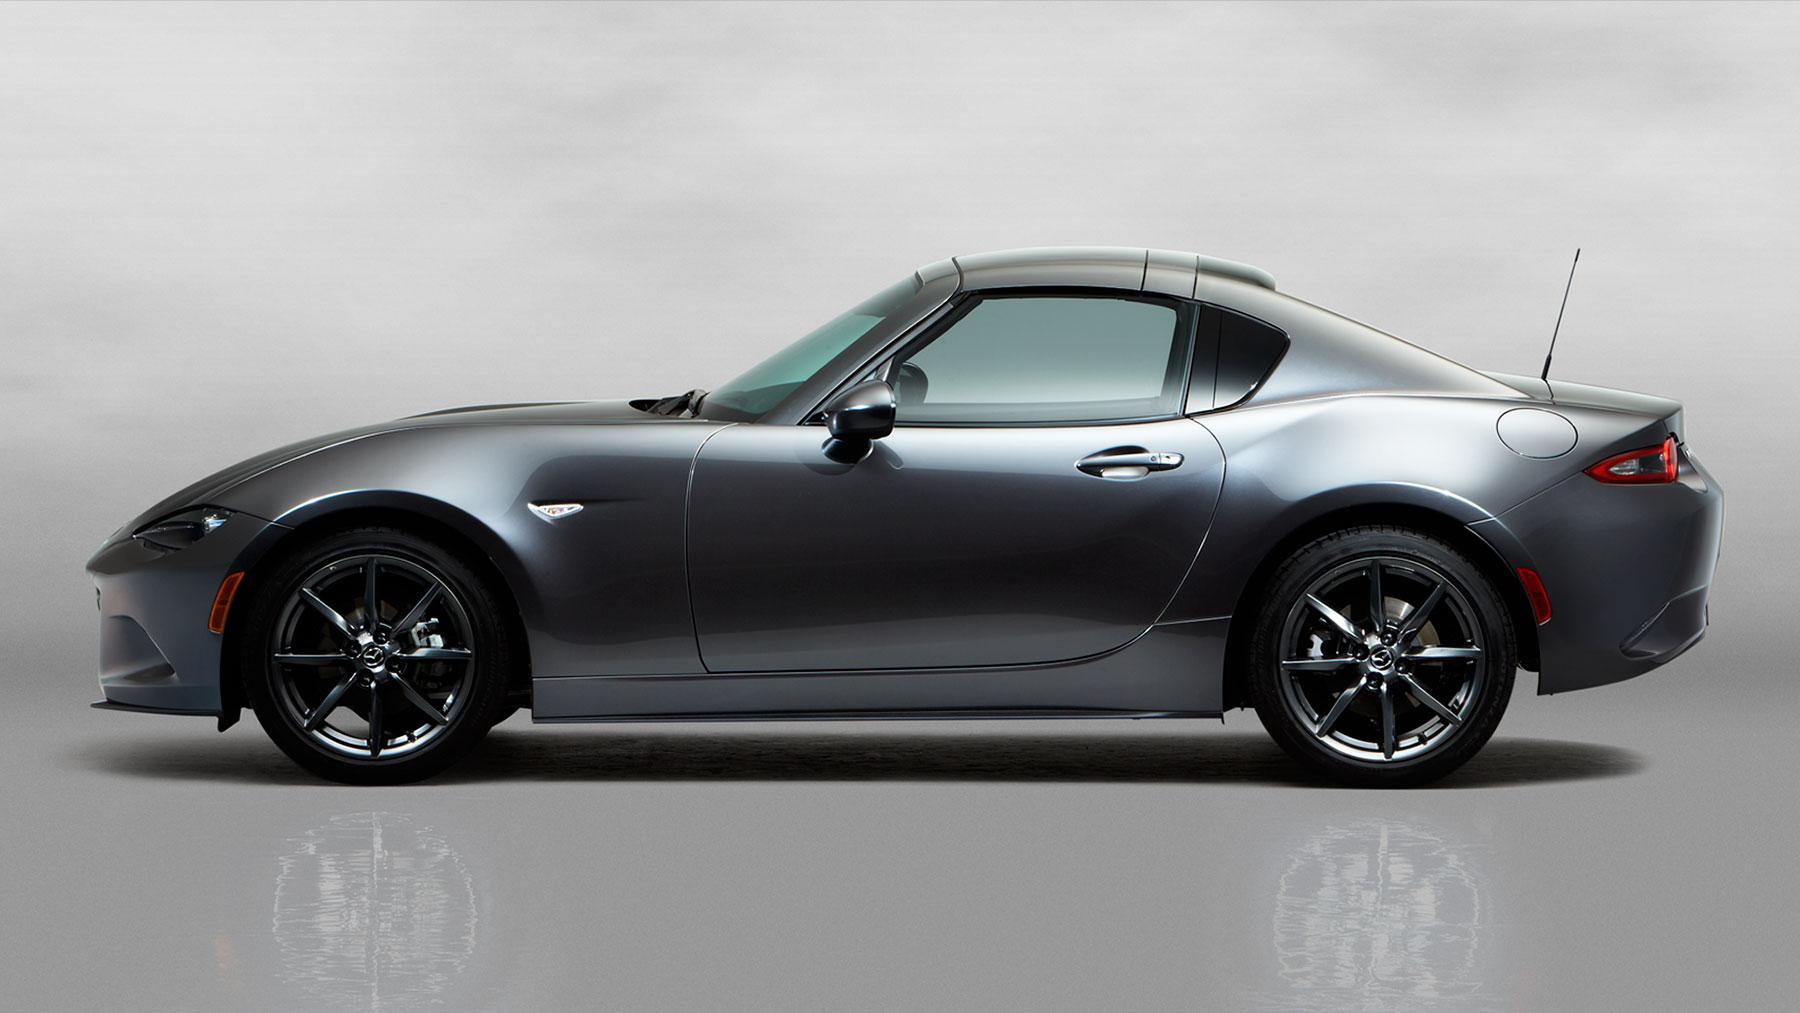 New Mazda MX-5 Miata Exterior main image